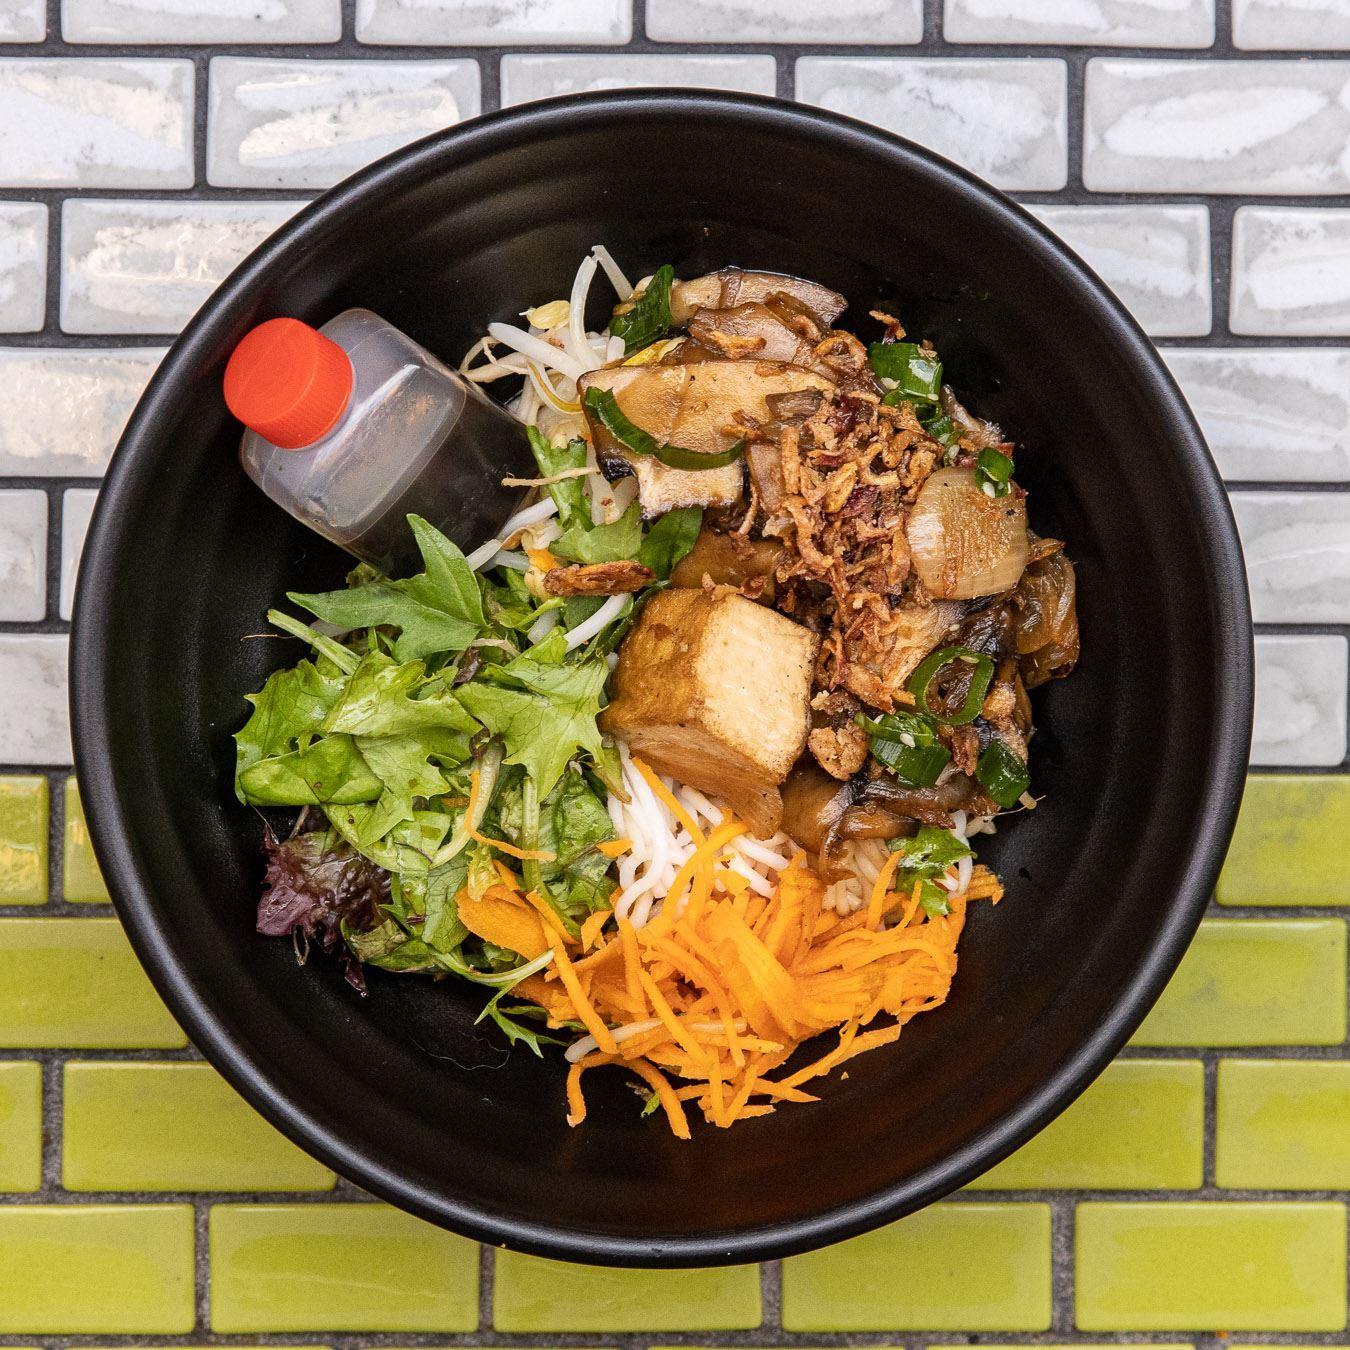 Mini Vermicelli Noodle Salad - Vegan Sauteed Shitake, Enoki & Shimeji Mushrooms